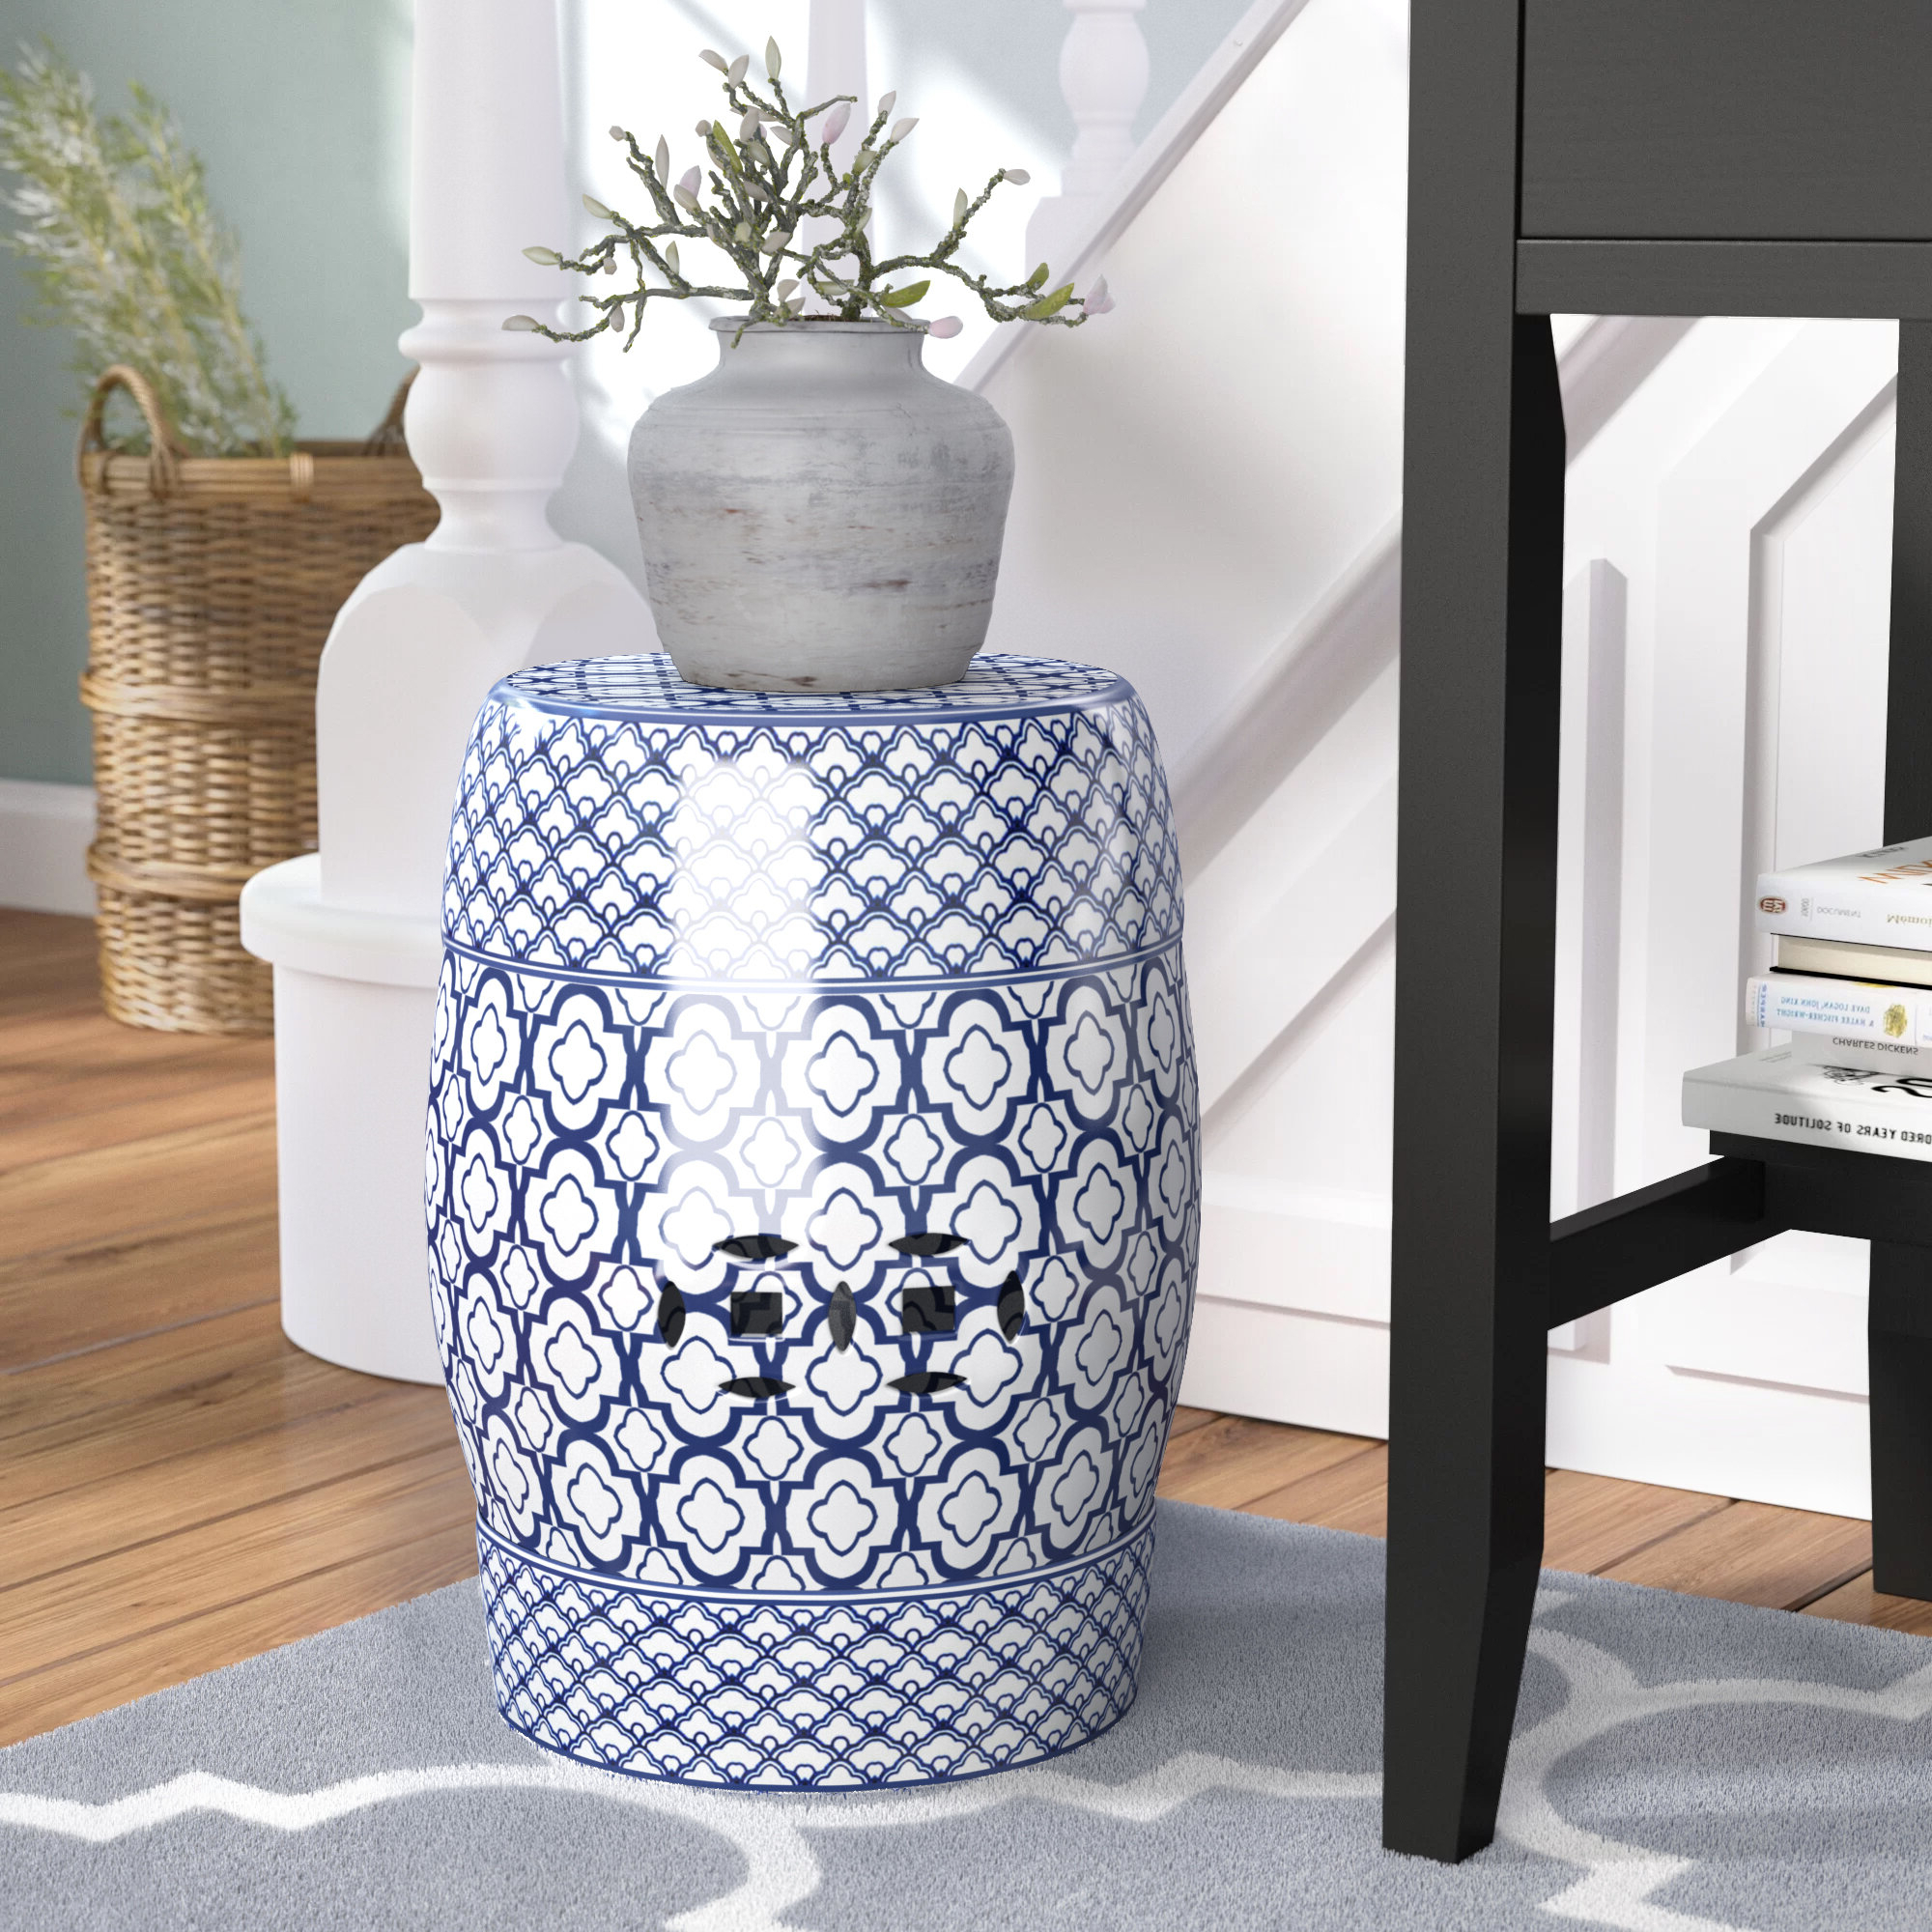 Wayfair Regarding 2020 Murphy Ceramic Garden Stools (View 10 of 30)